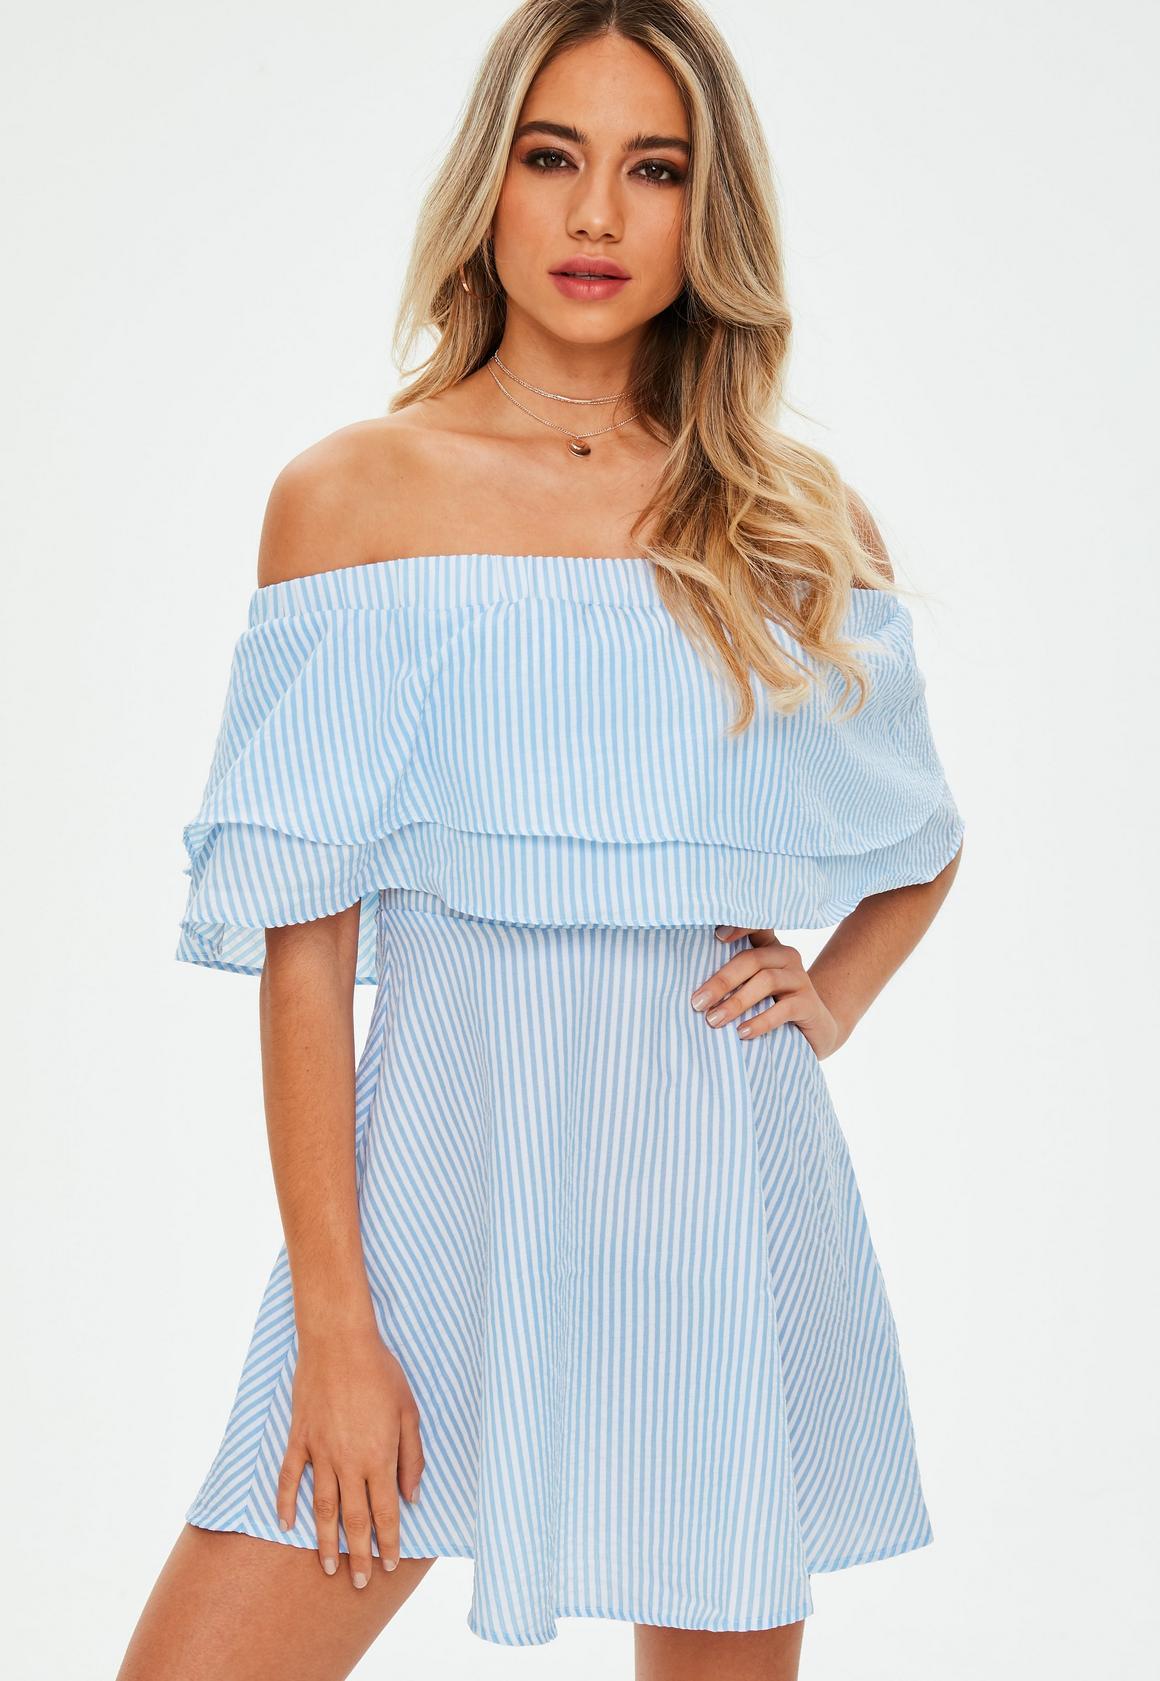 Blue And White Striped Ruffle Layer Bardot Swing Dress | Missguided